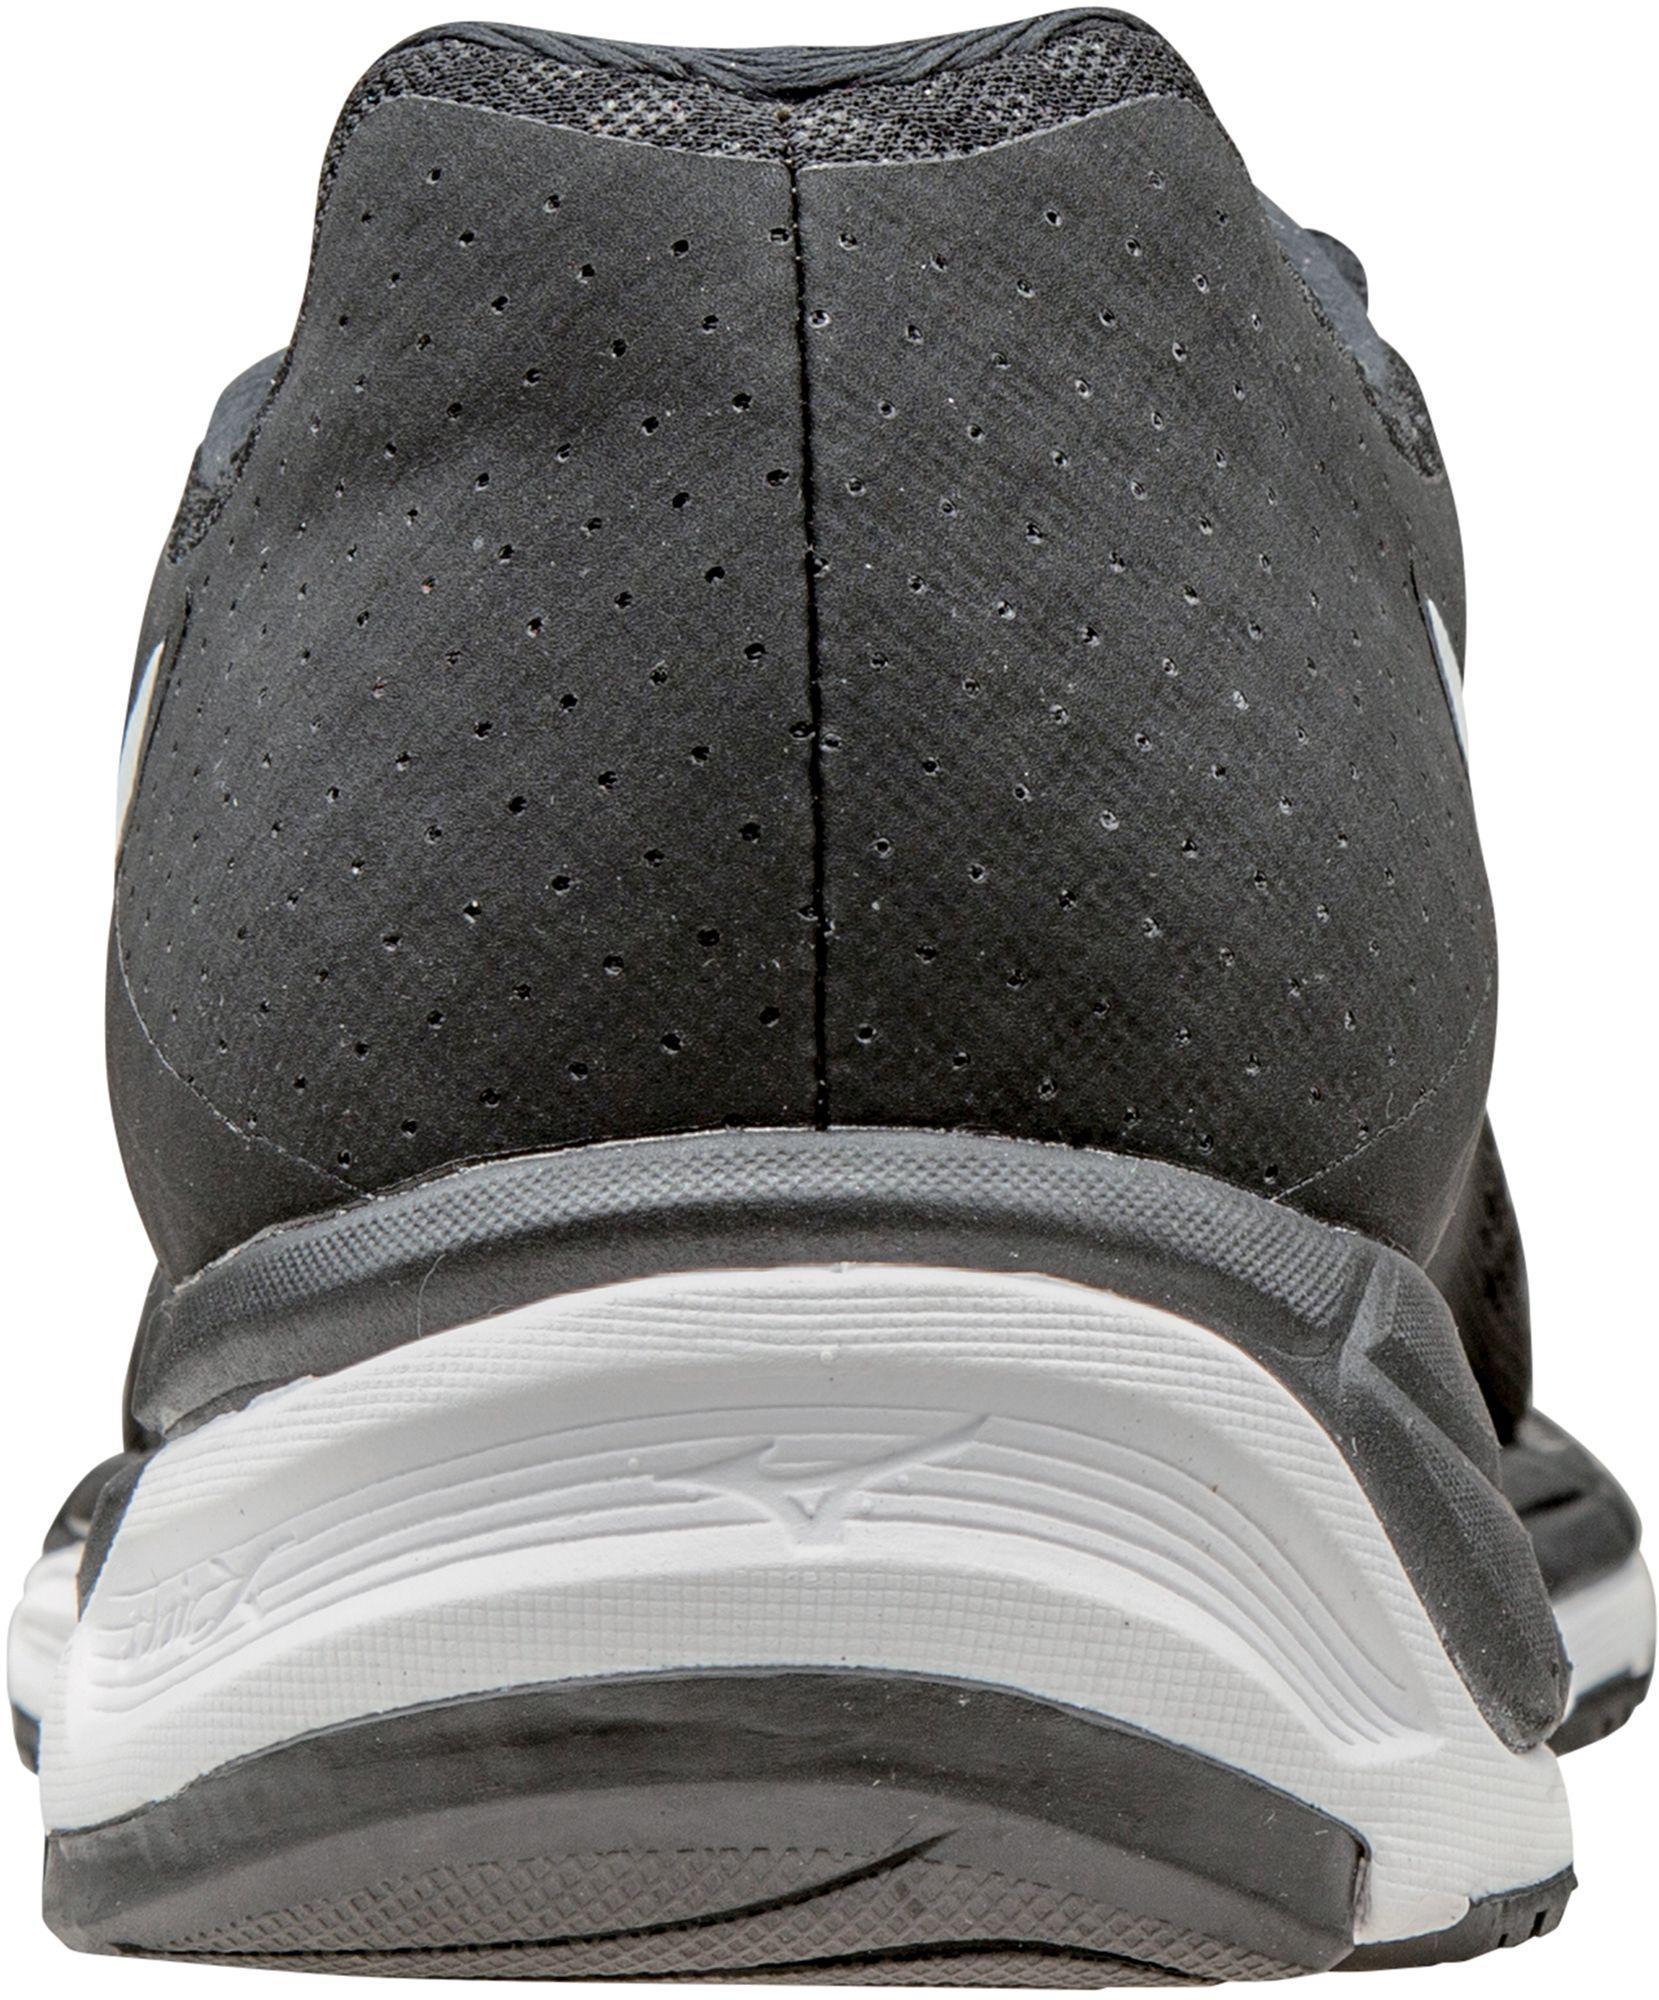 762247ce15b Lyst - Mizuno Synchro Mx Trainer Baseball Shoes in Black for Men